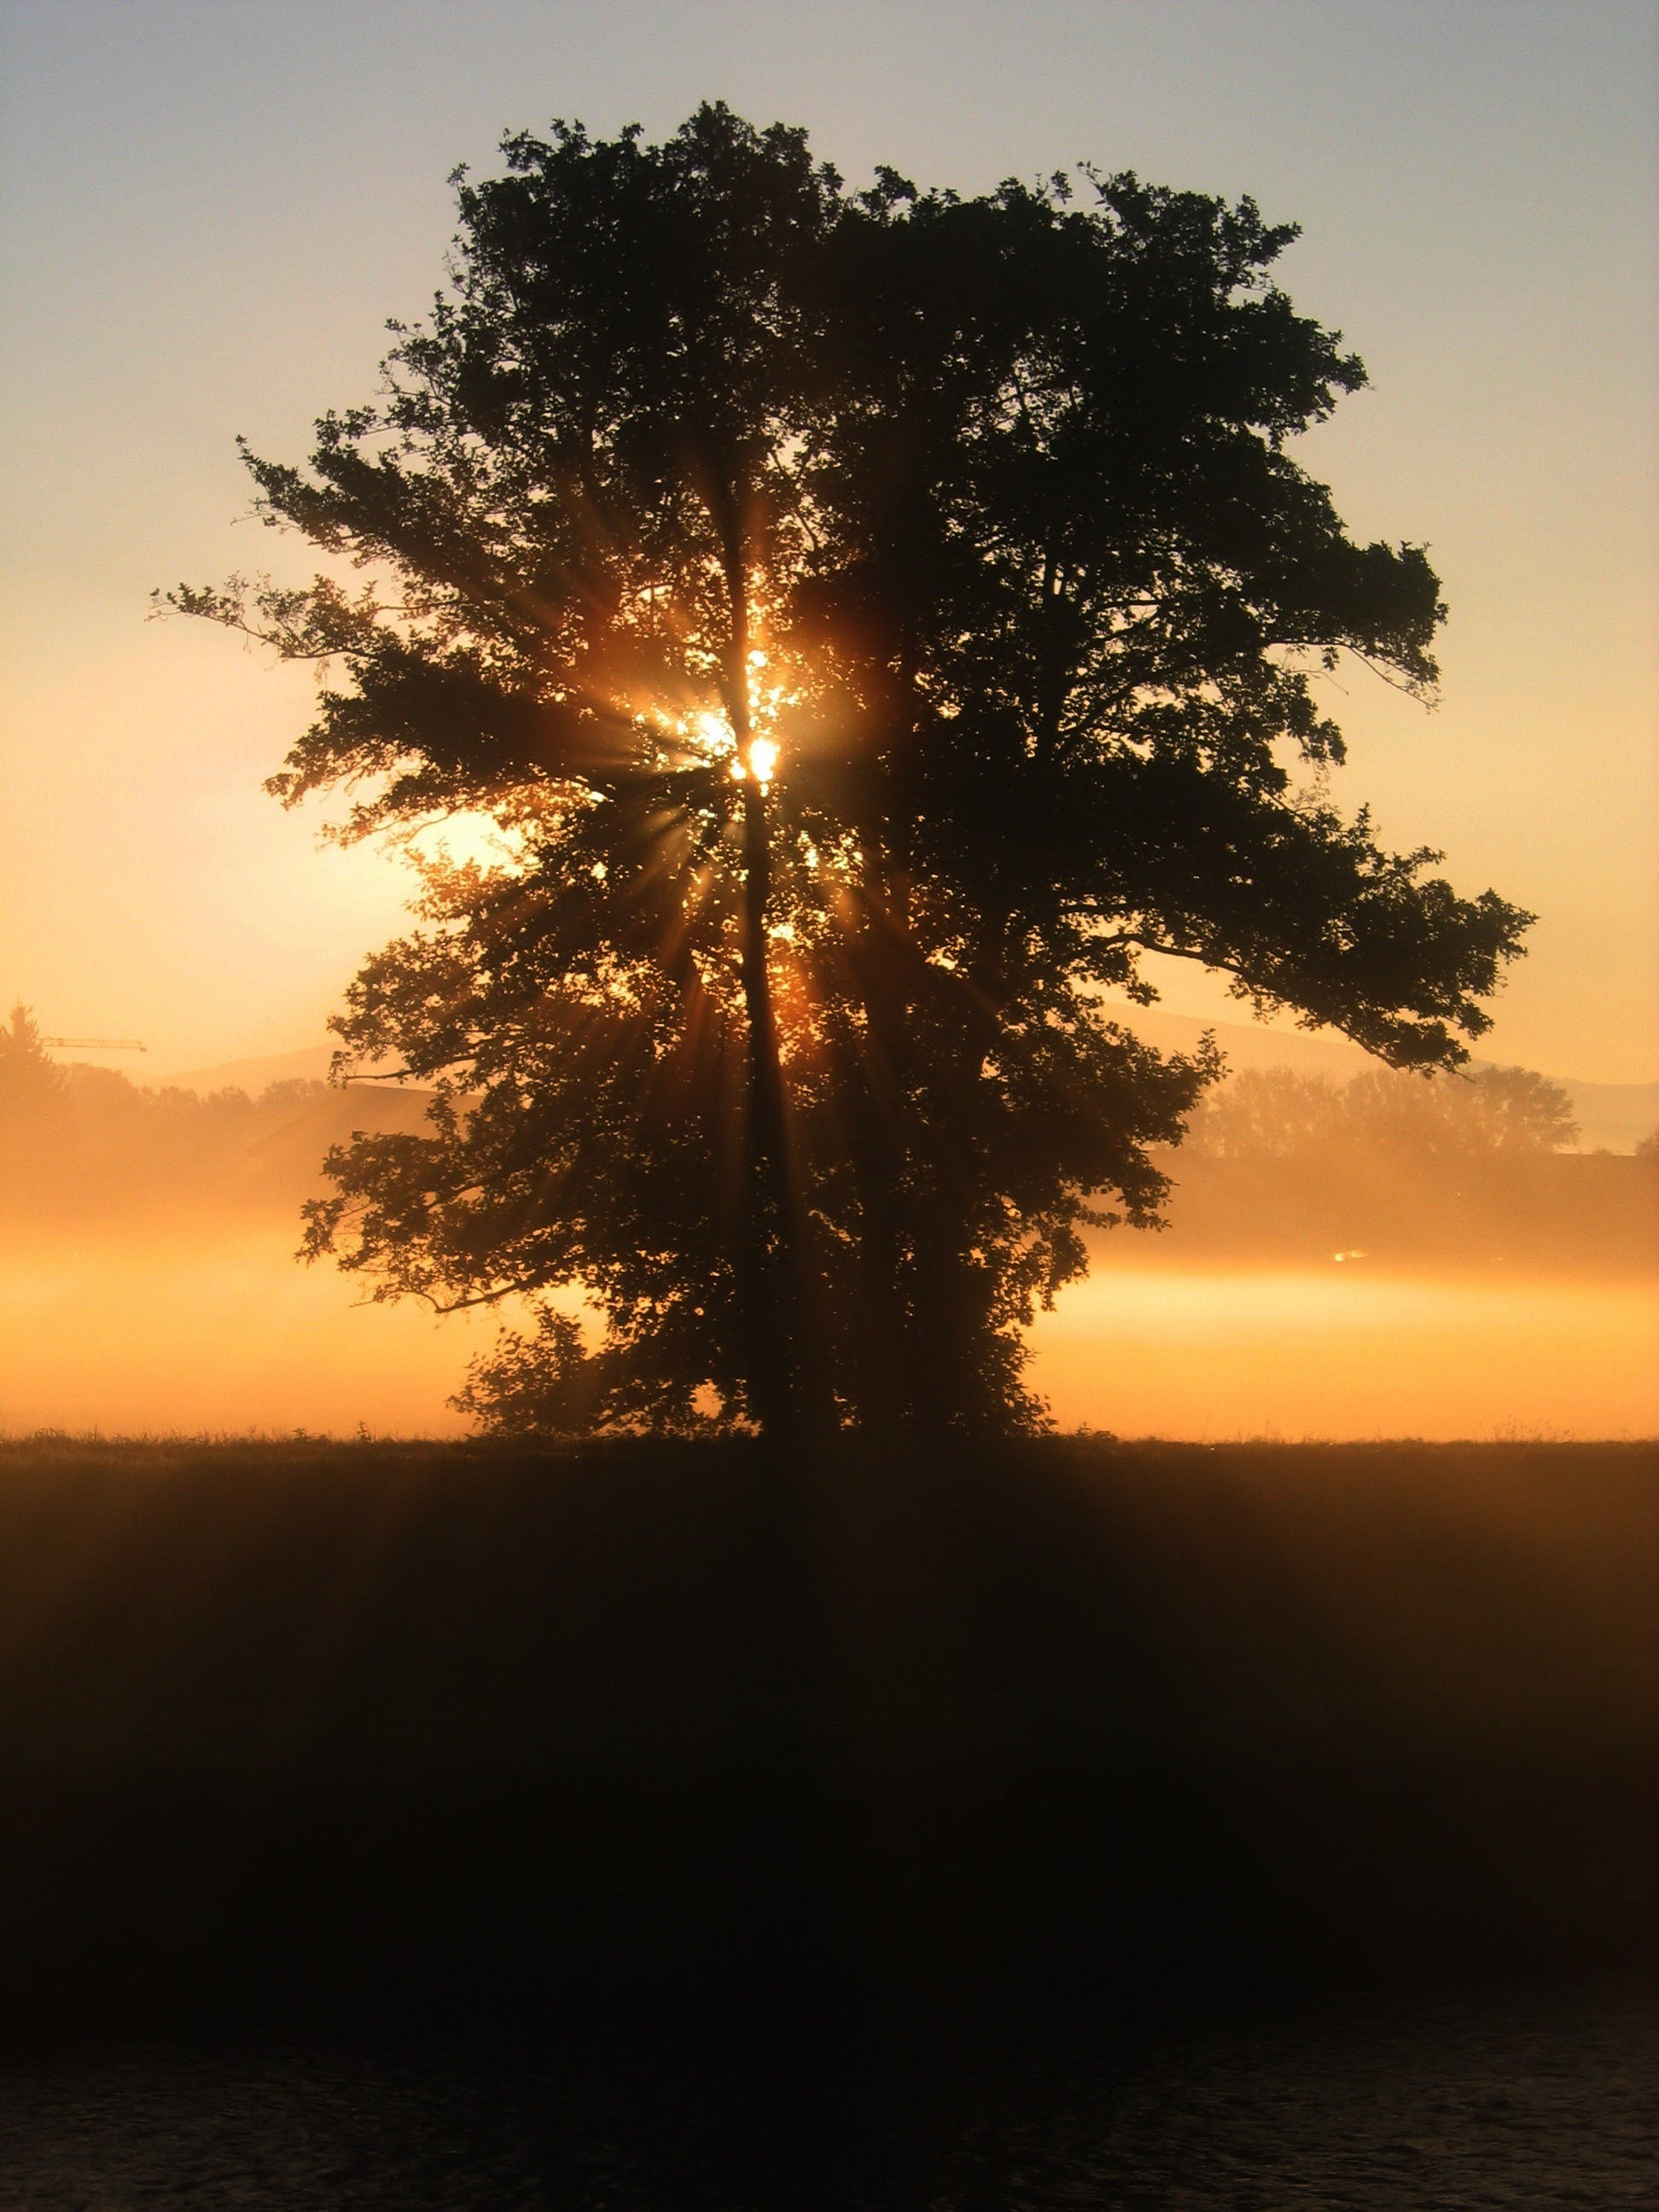 Gratis arkivbilde med himmel, natur, sol, solnedgang